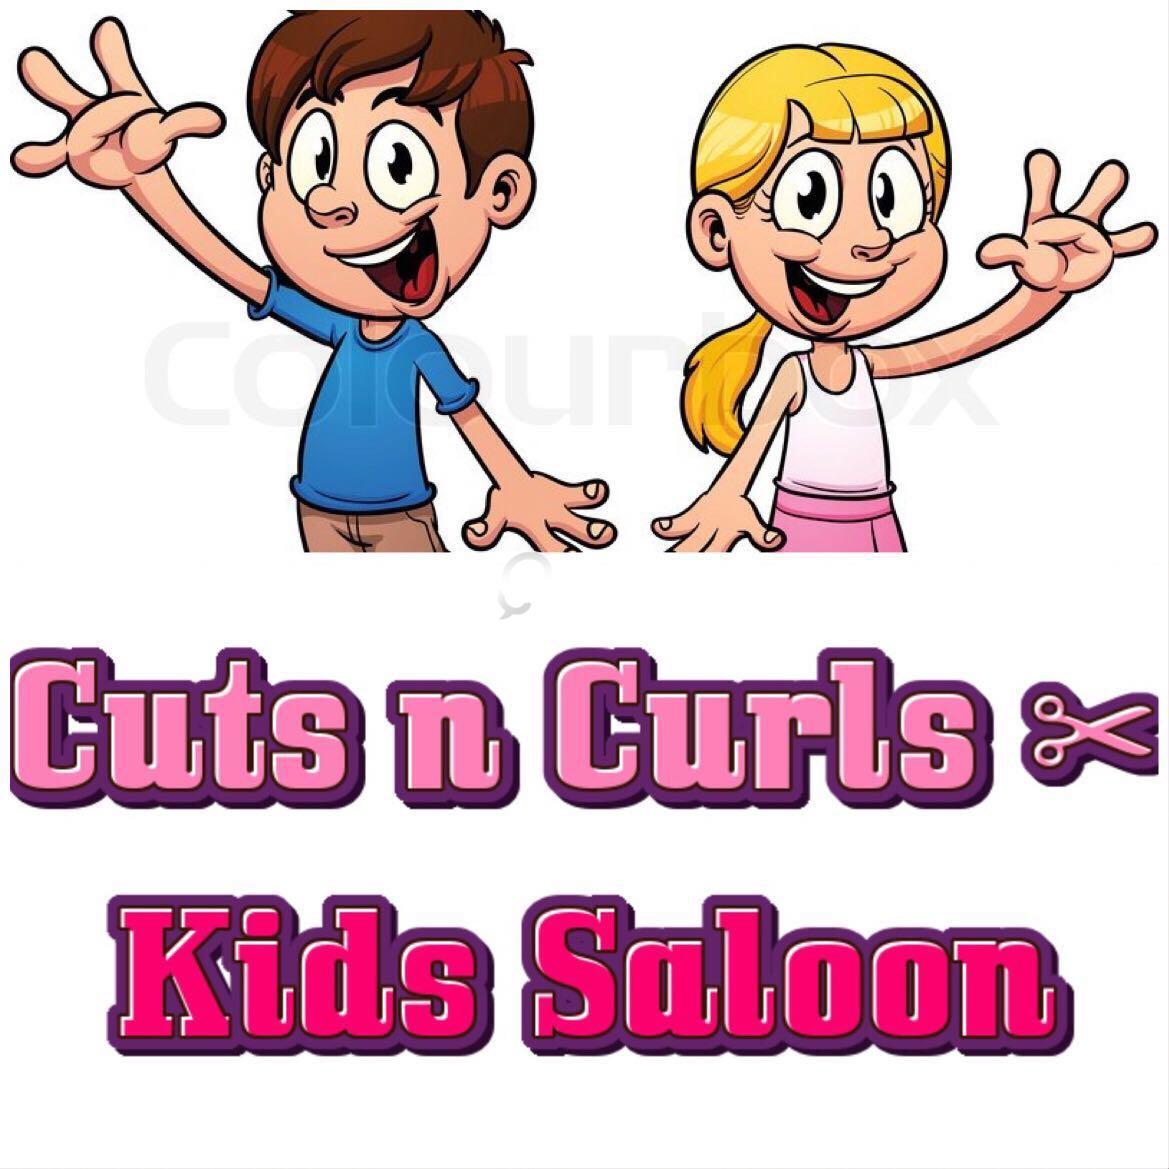 HAIR CUTTING STAFF FOR KIDS SALOON | Qatar Living